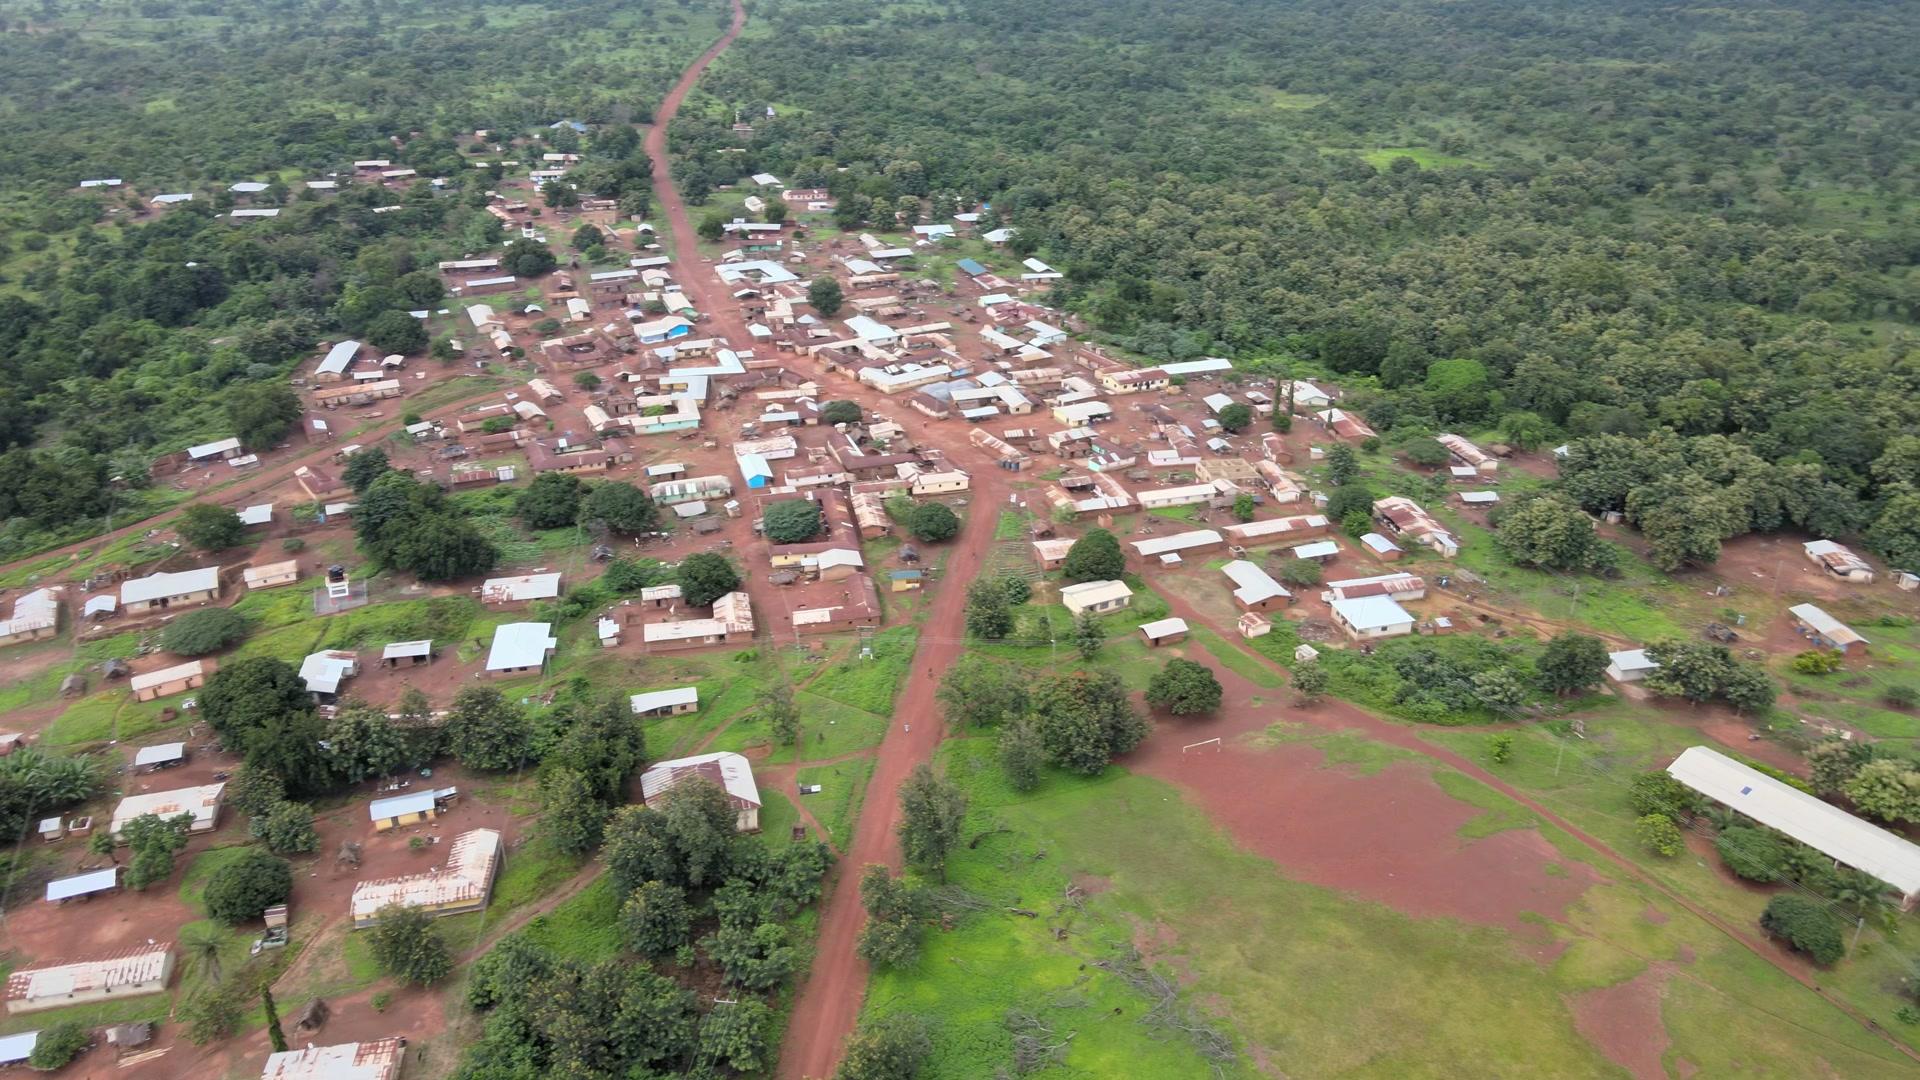 Village Remote Community Grassland Spin 360 Full